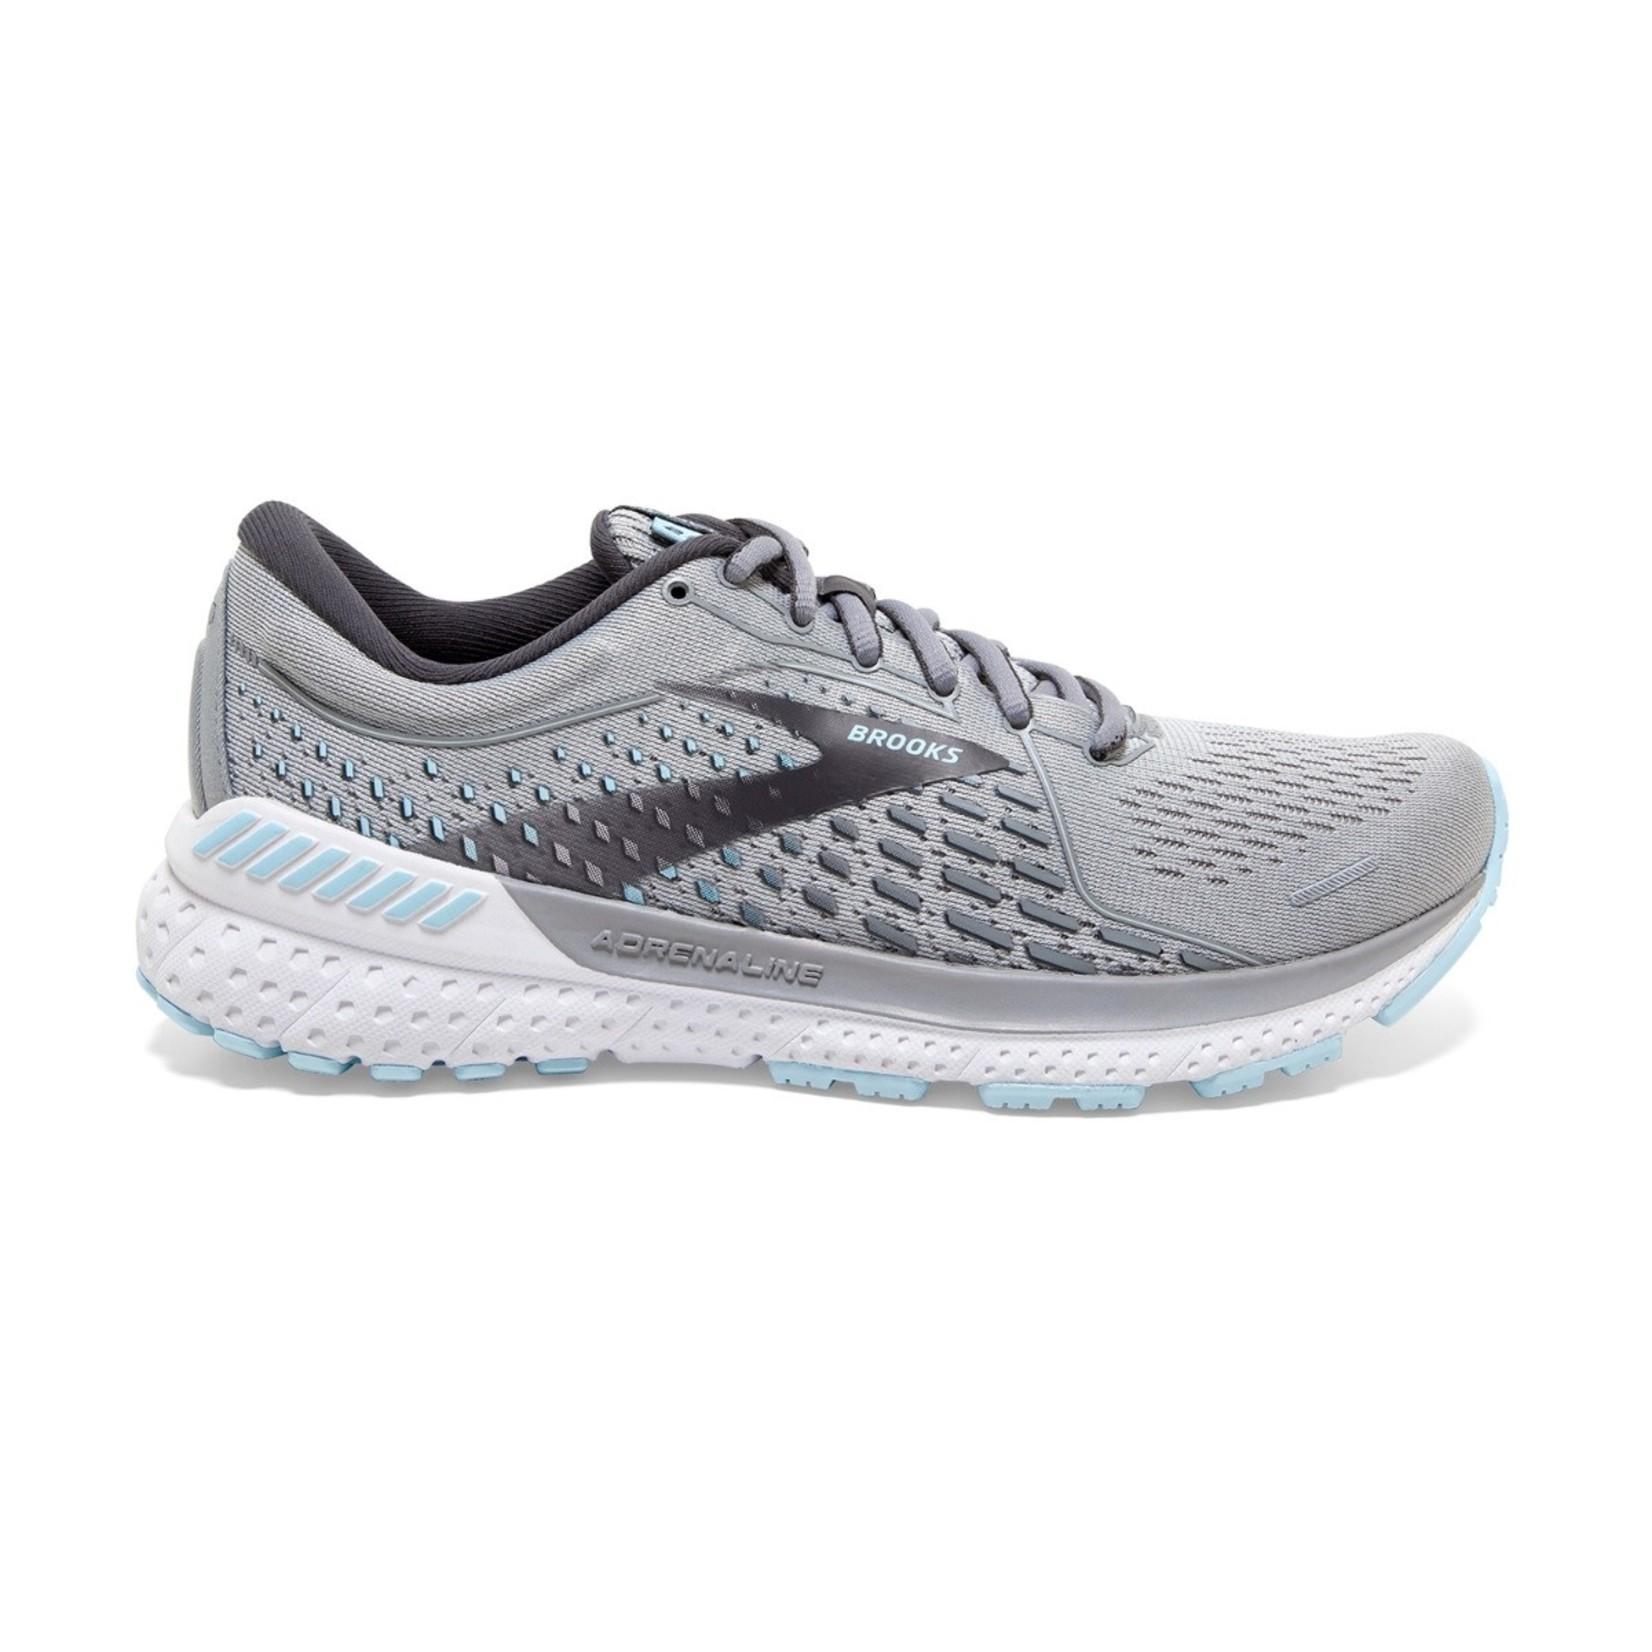 Brooks Brooks Running Shoes, Adrenaline GTS 21, Ladies